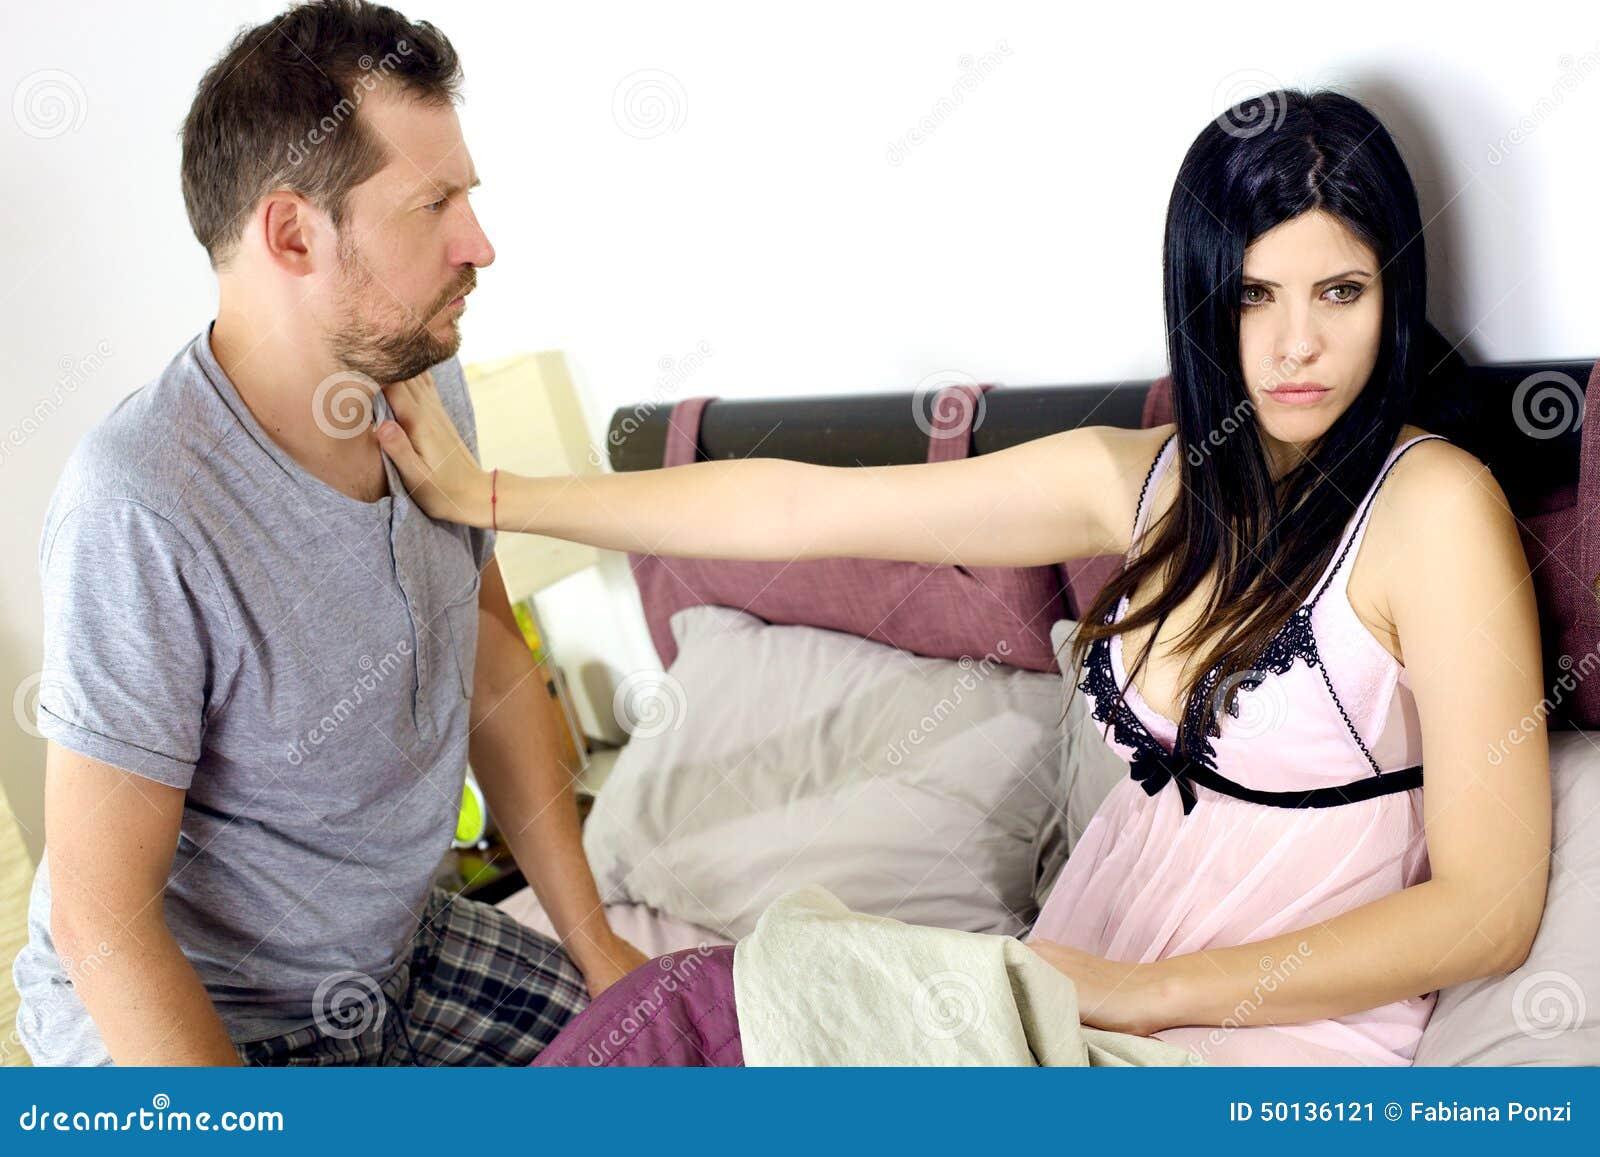 Mature horny woman seducing young boys